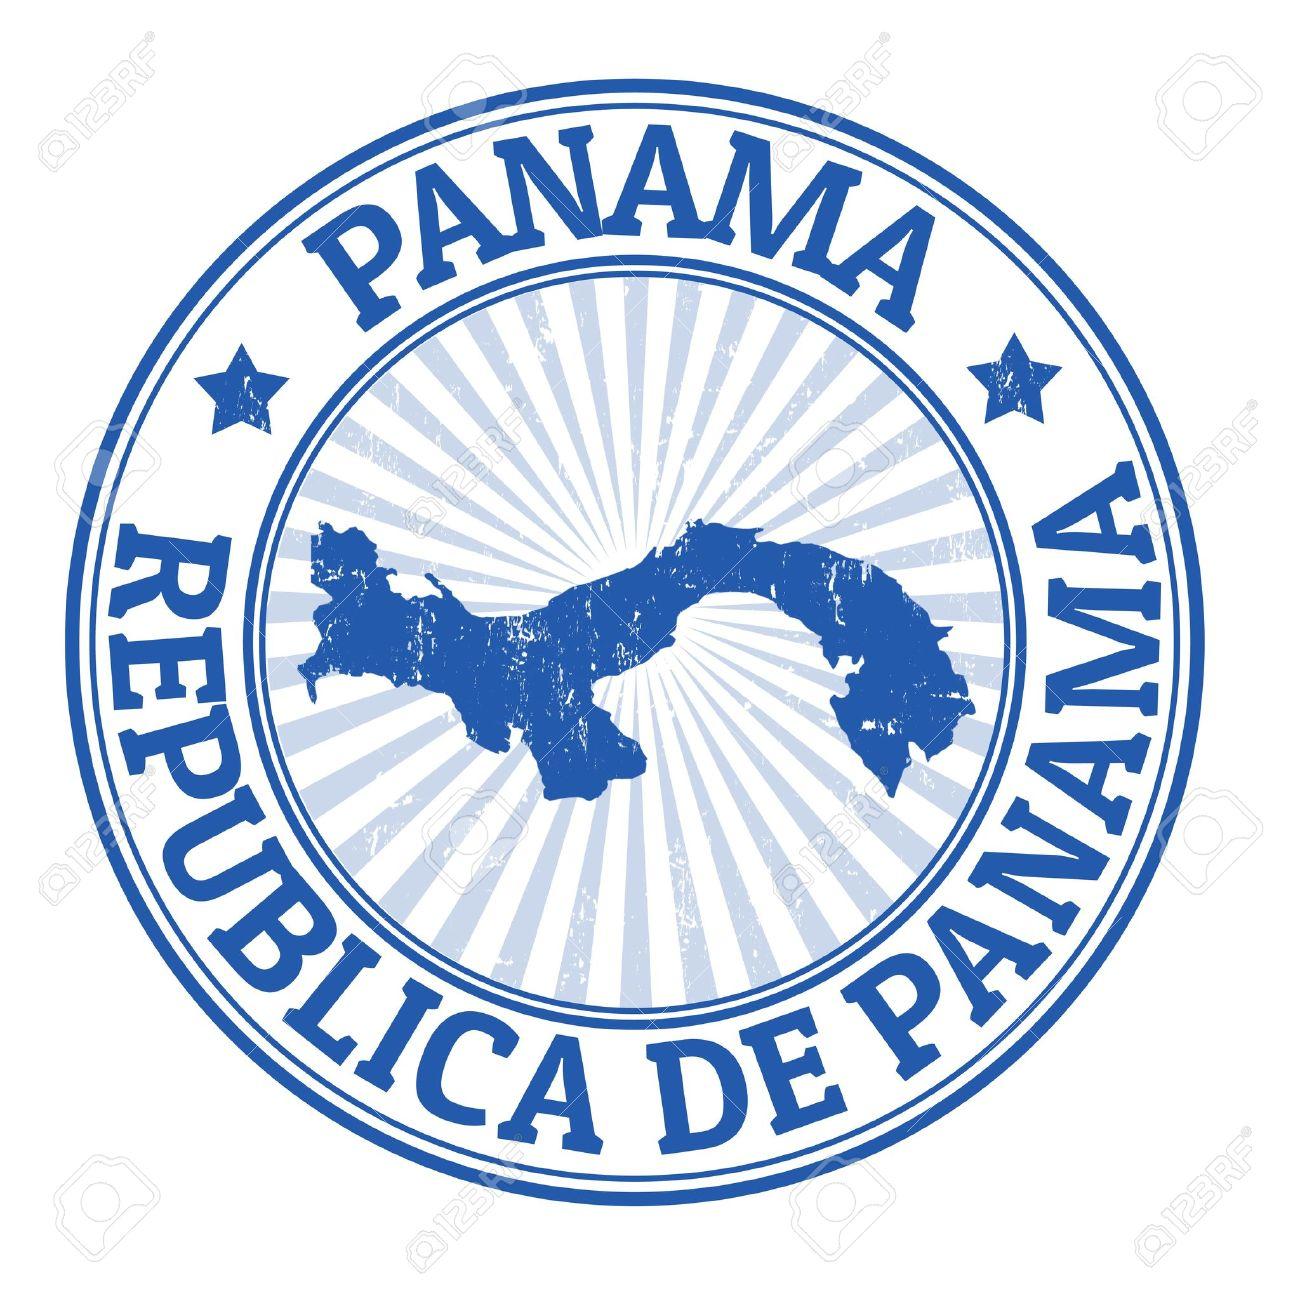 Panama clipart #12, Download drawings